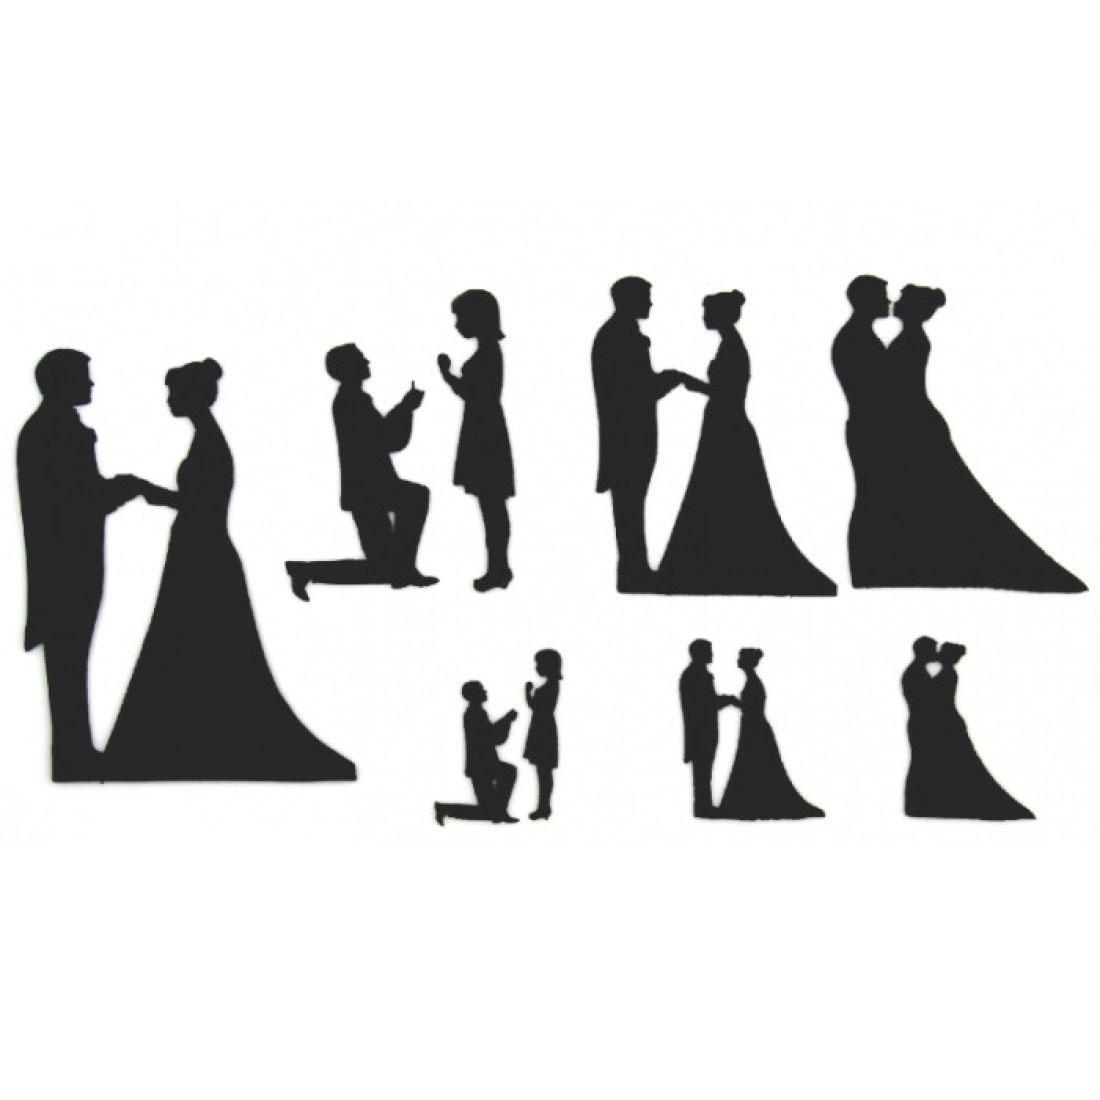 Wedding silhouette set silhouette wedding cake cutters wedding silhouette cake wedding silhouette cutter set junglespirit Gallery